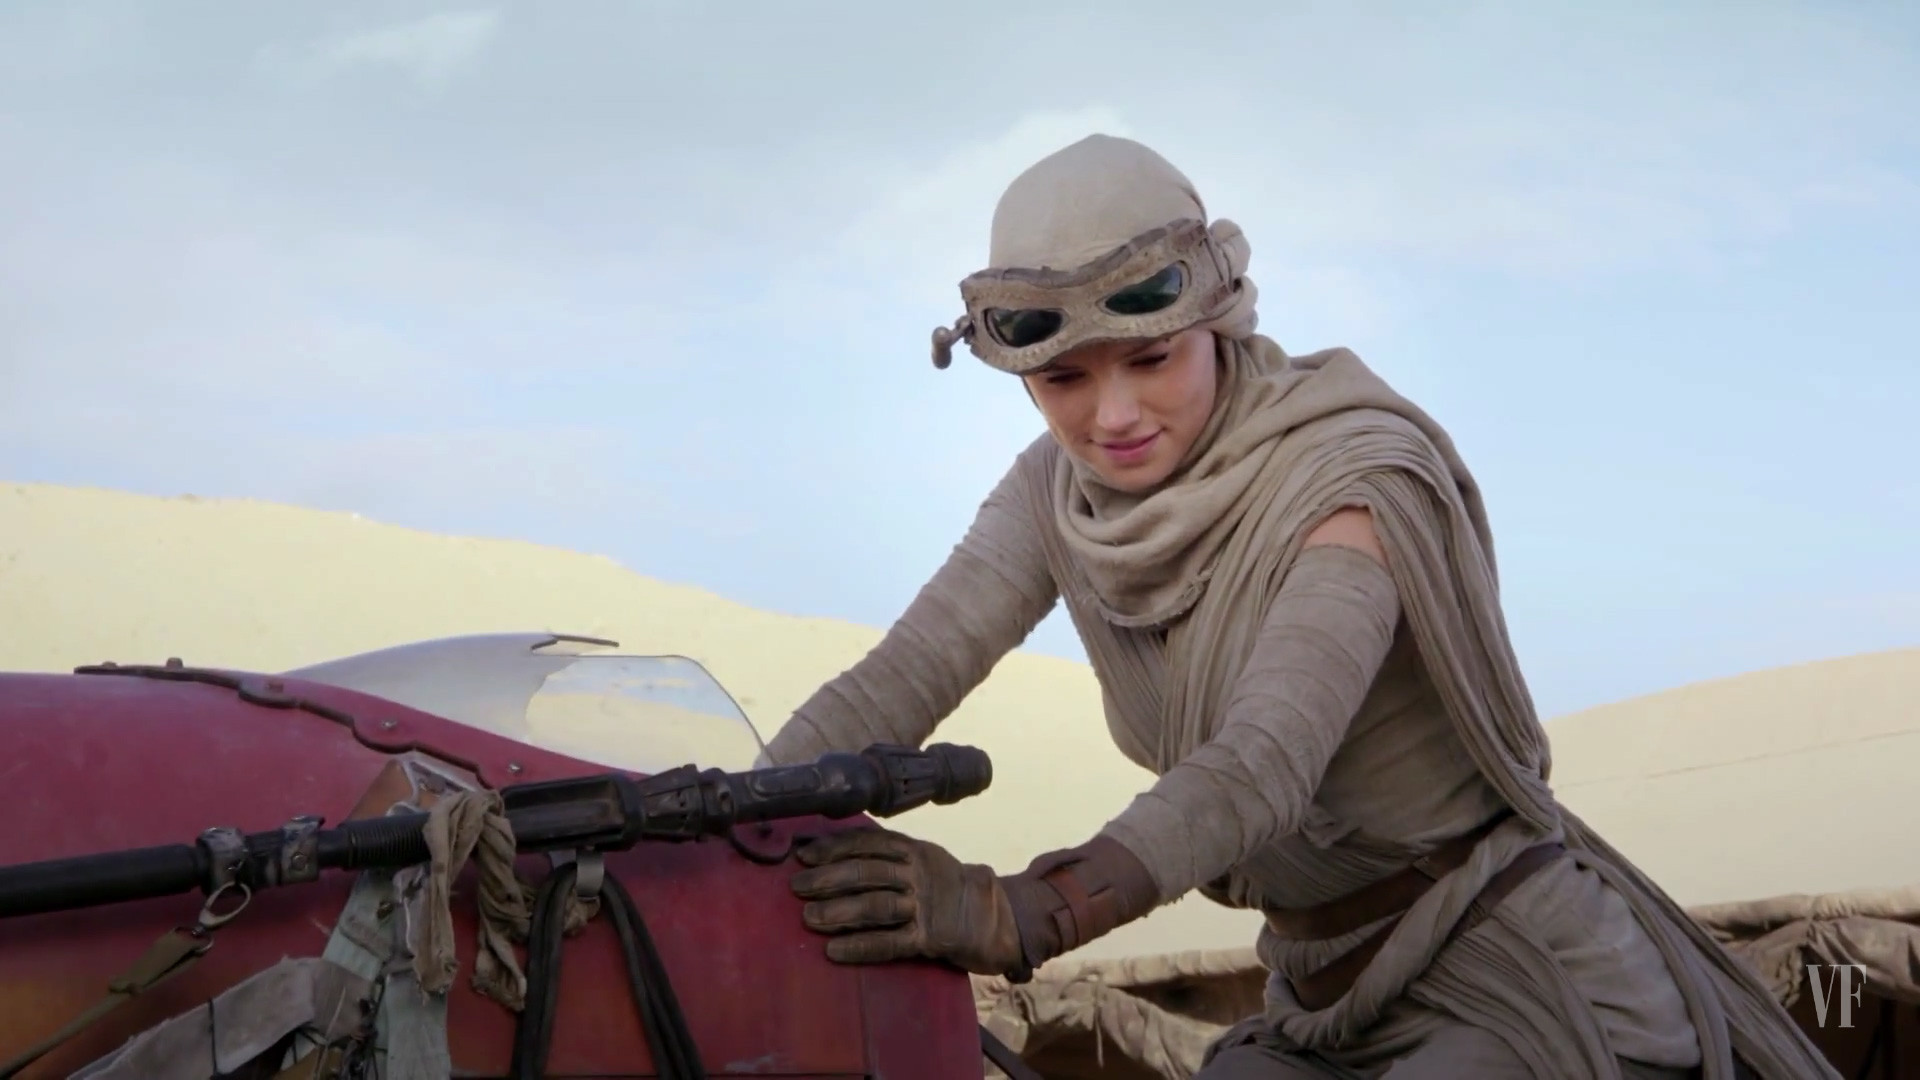 Rey riding her Speeder – Star Wars 7: The Force Awakens wallpaper